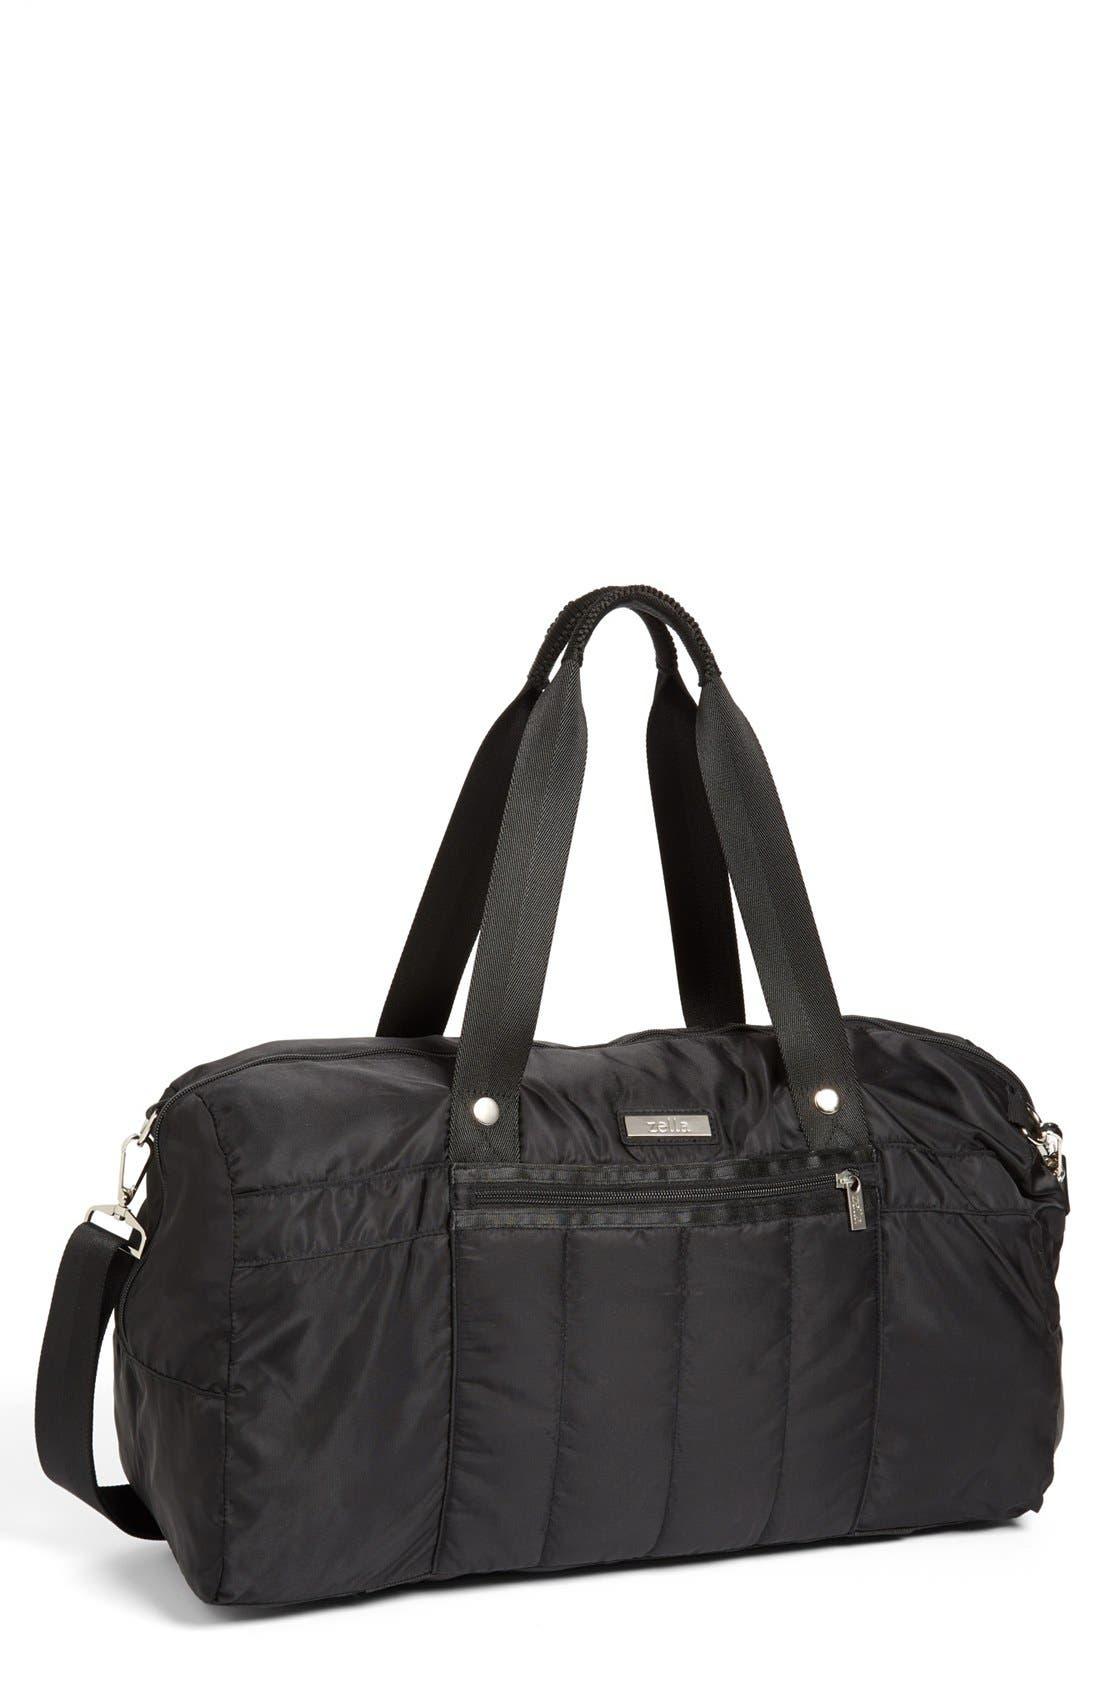 Main Image - Zella Quilted Gear Duffel Bag